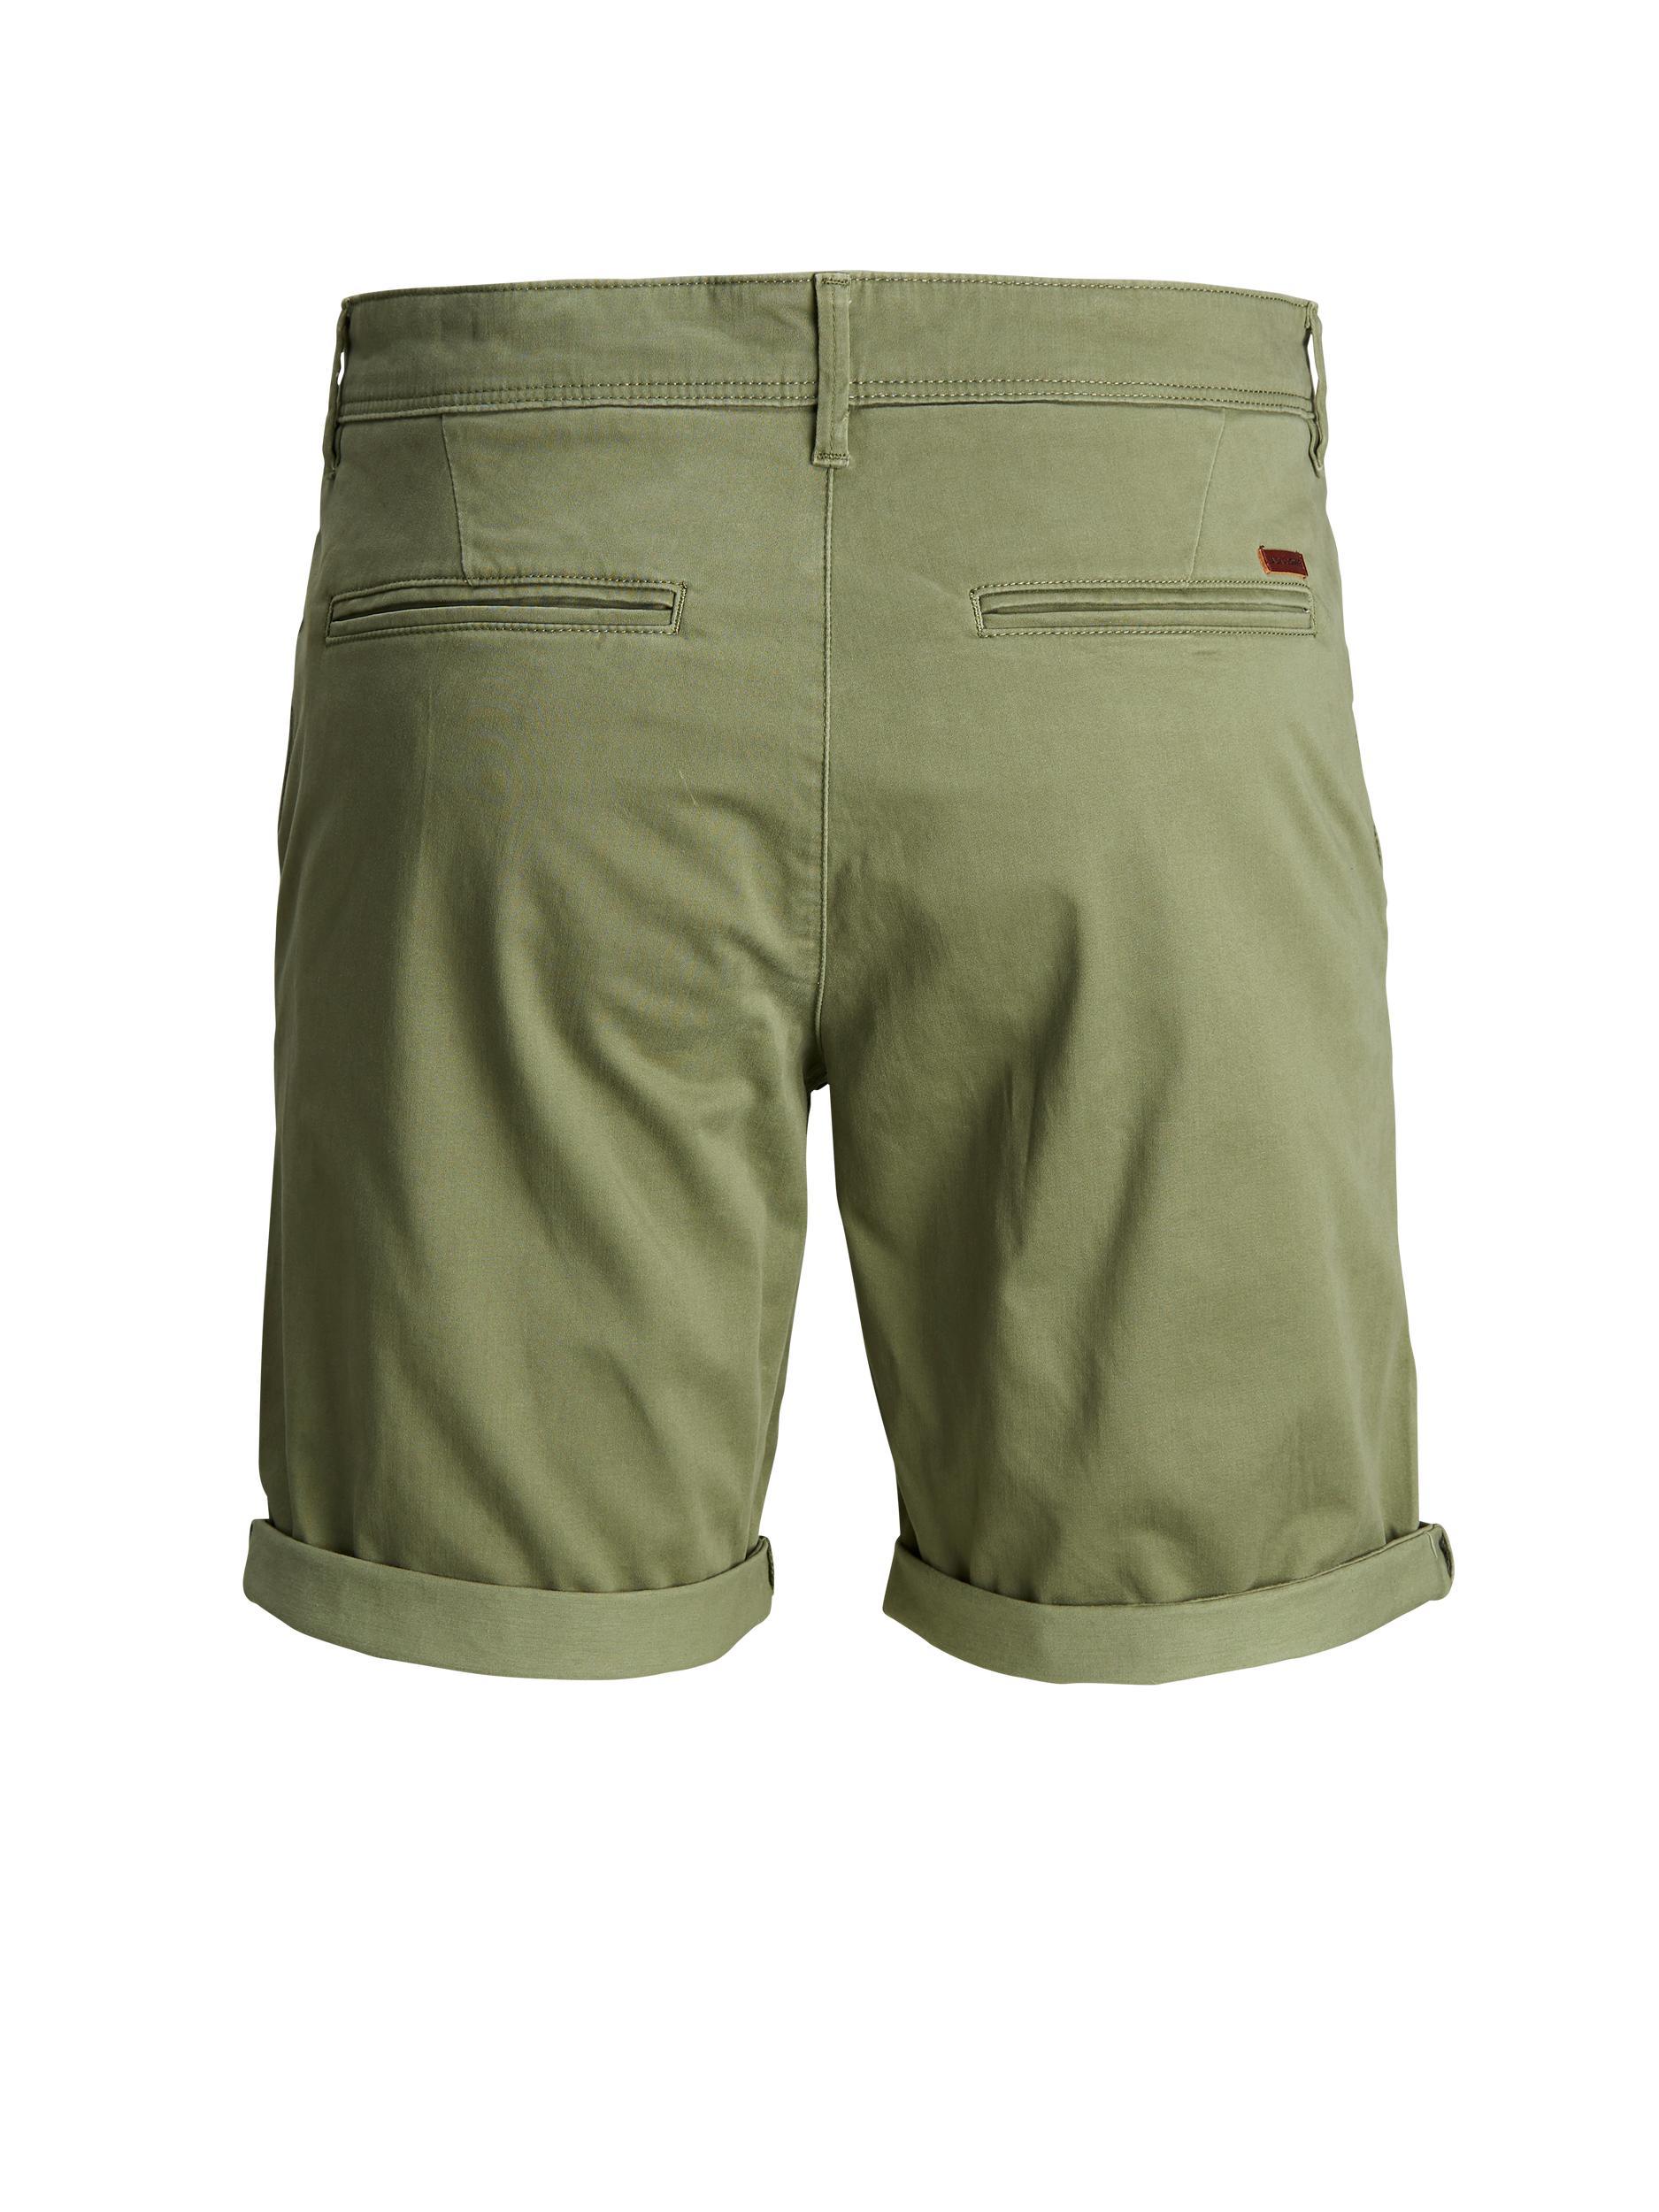 Jack & Jones Bowie shorts, deep lichen green, medium